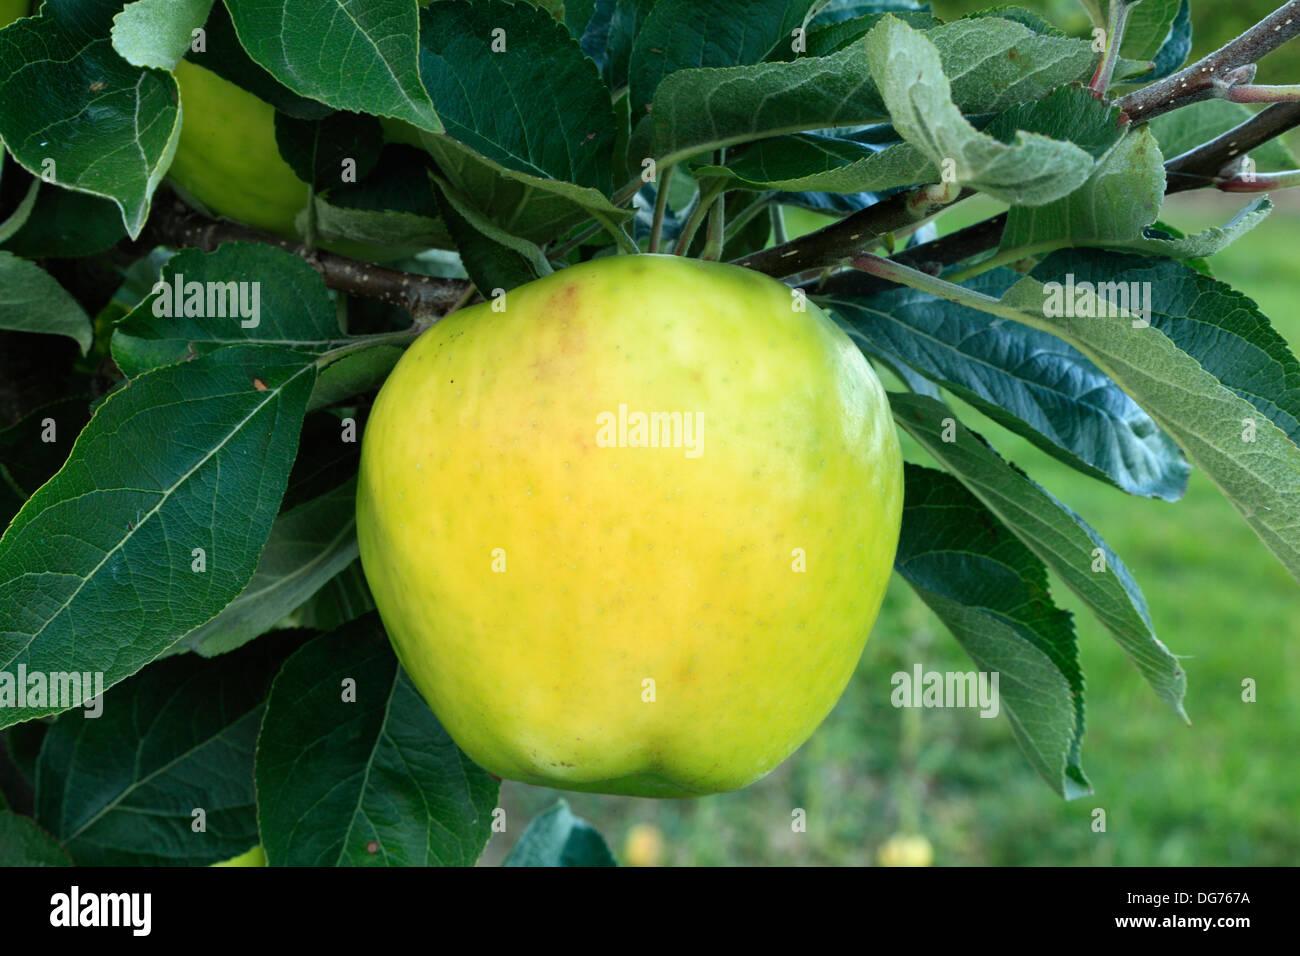 Apple 'Hambling's Seedling', culinary cooking variety, malus domestica, apples variety varieties growing on tree - Stock Image